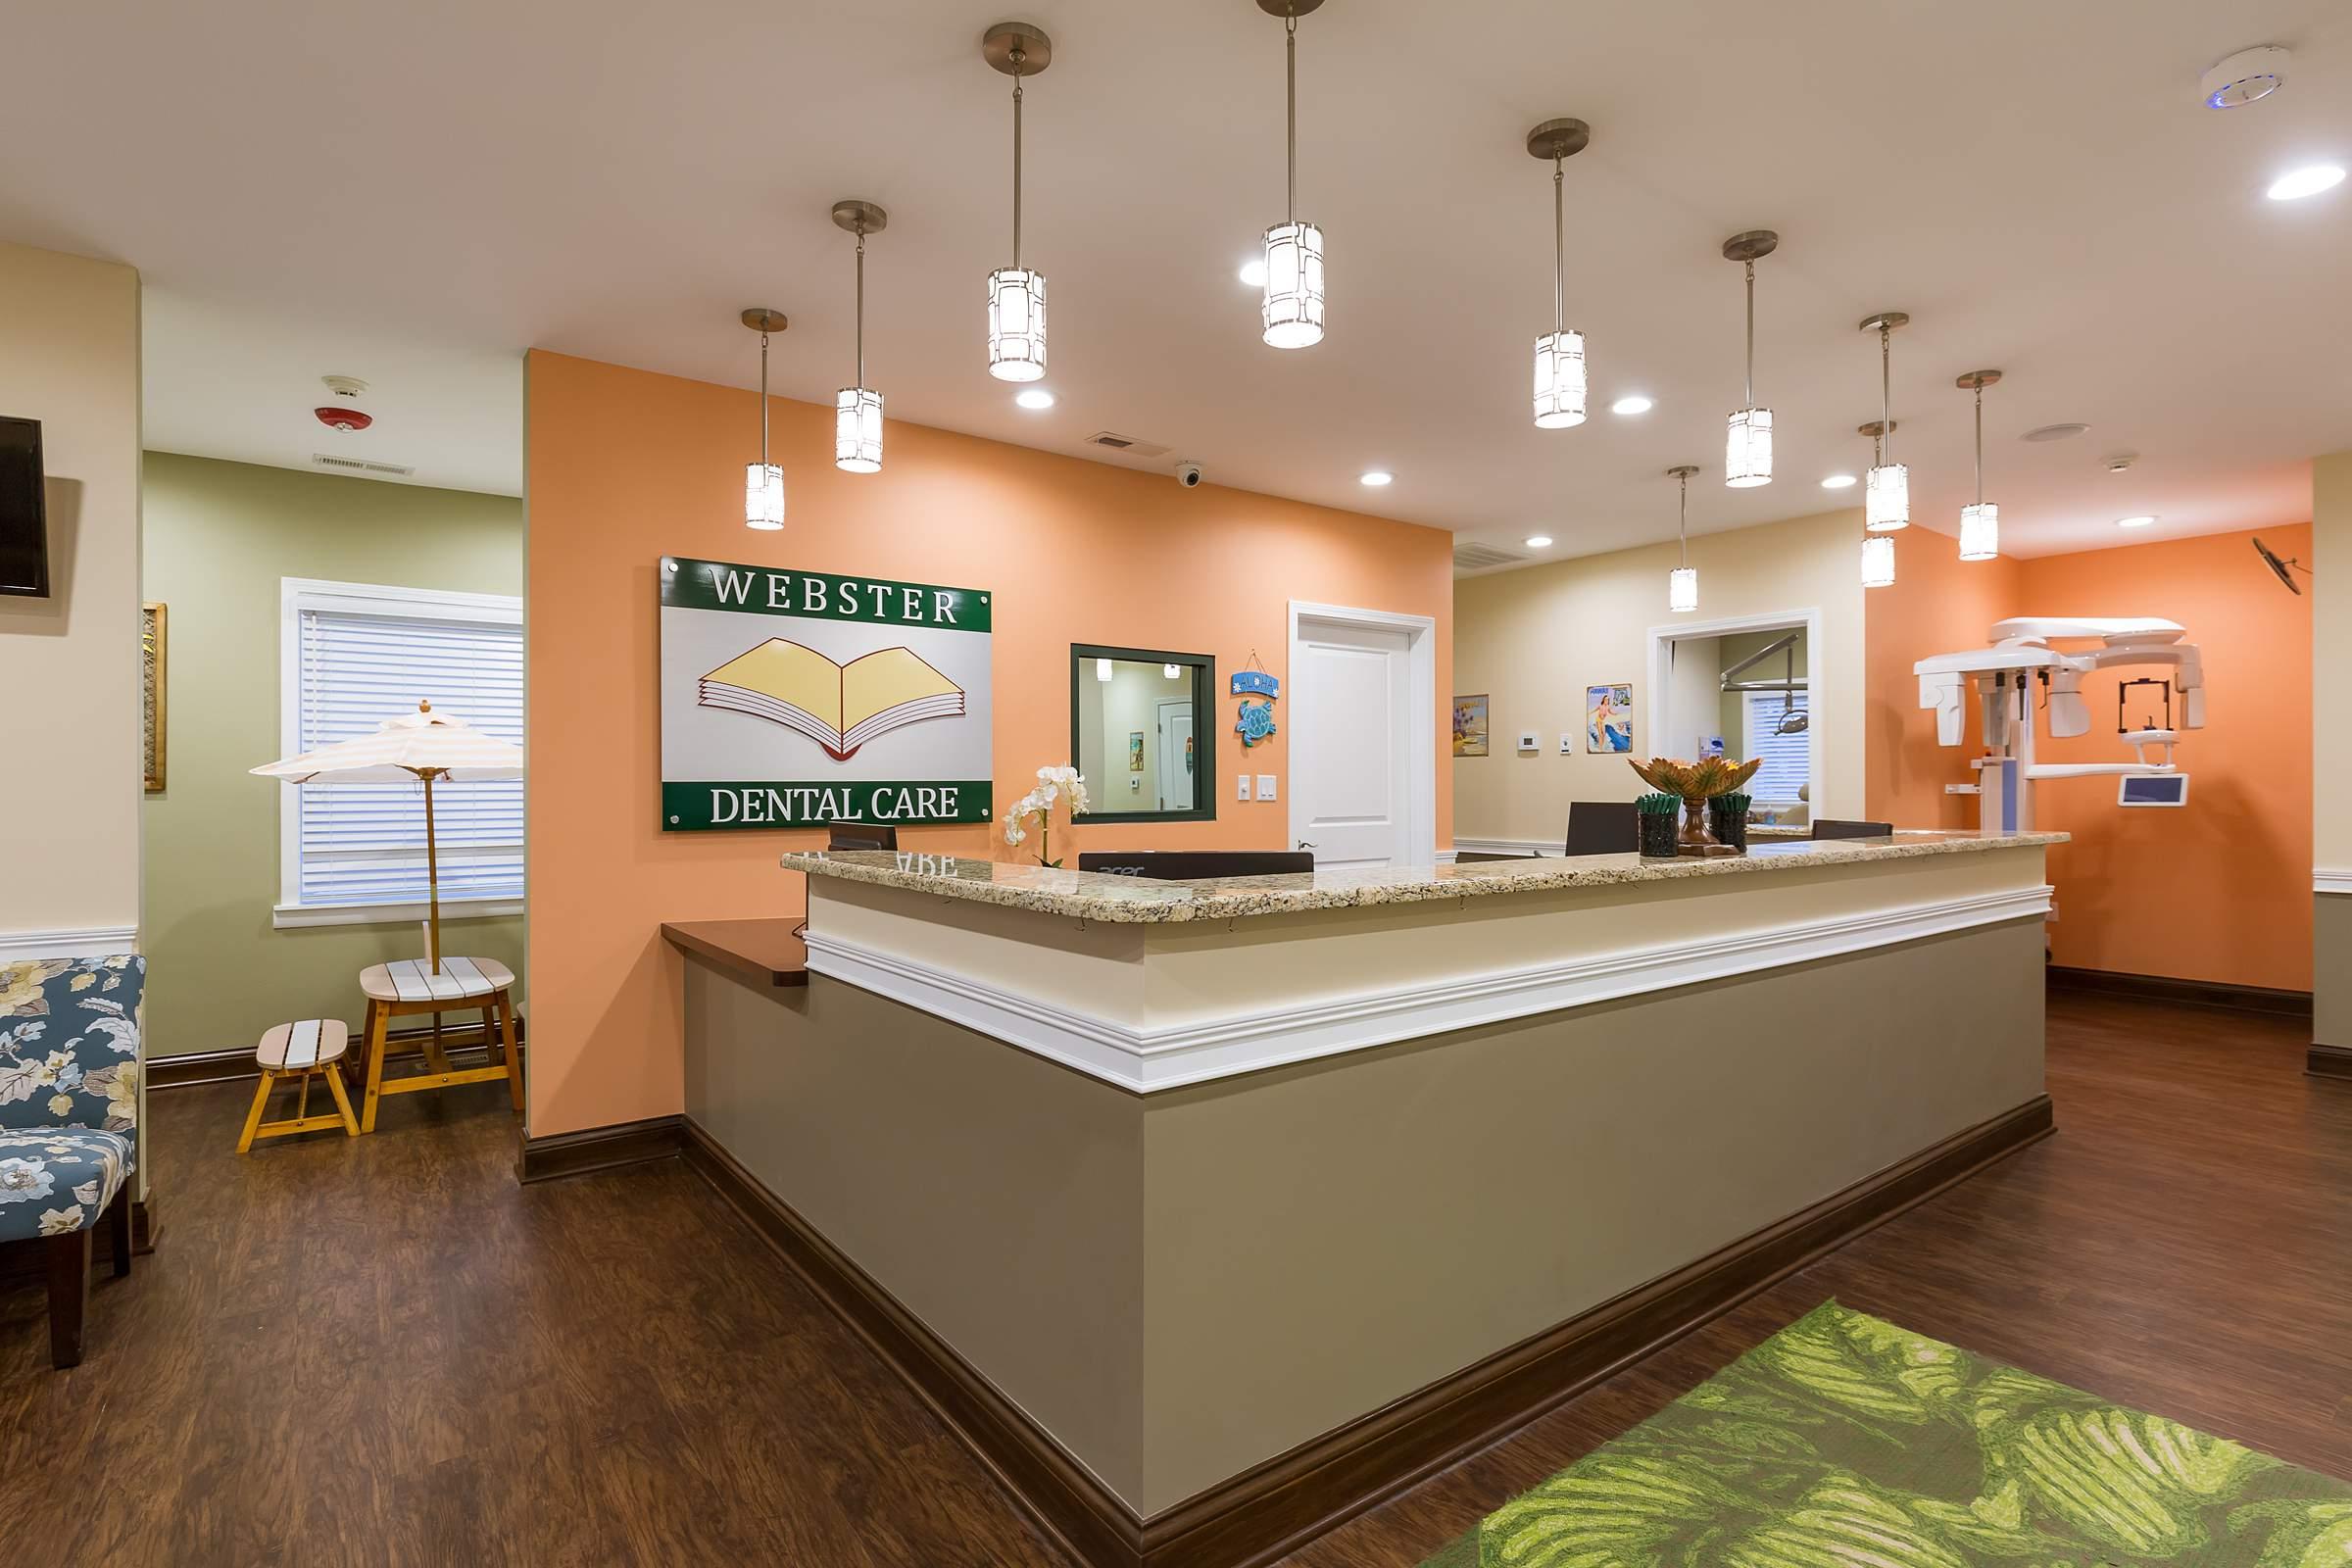 Webster Dental Care Of La Grange Park Illinois Chicago Western Burbs Google Trusted Photographer